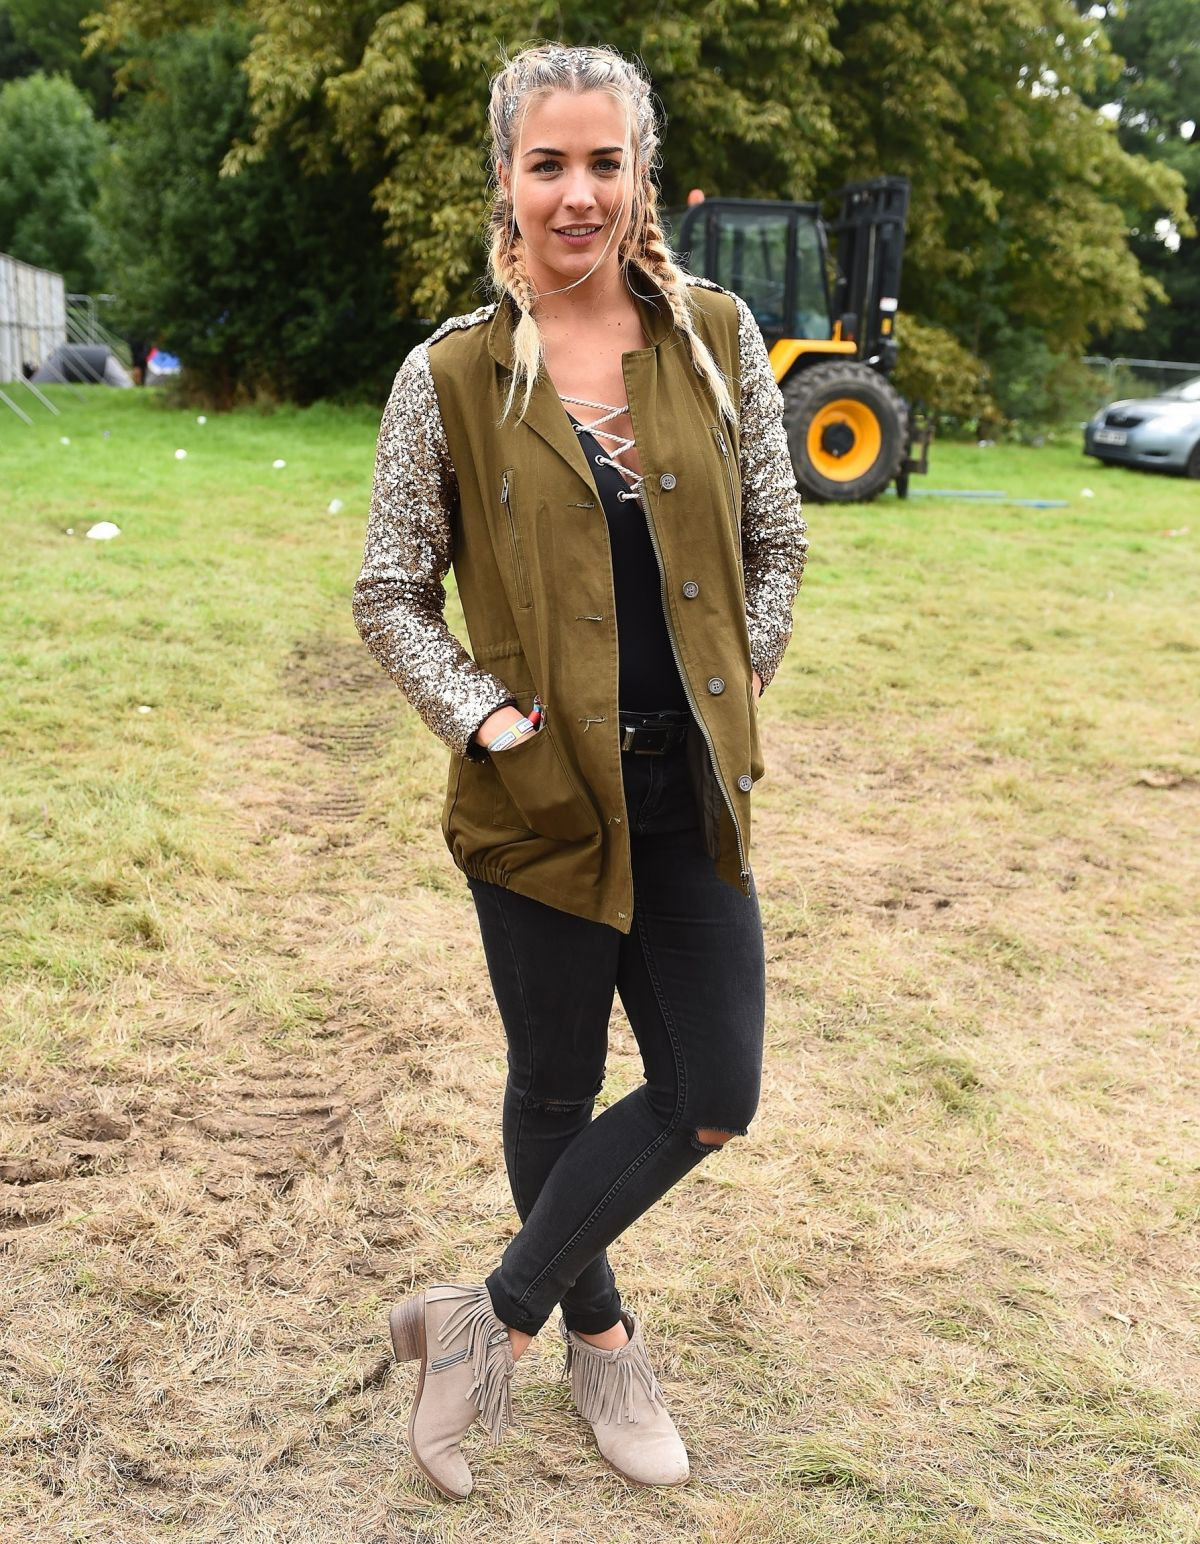 GEMMA ATKINSON at V Festival in Chelmsford 08/19/2017